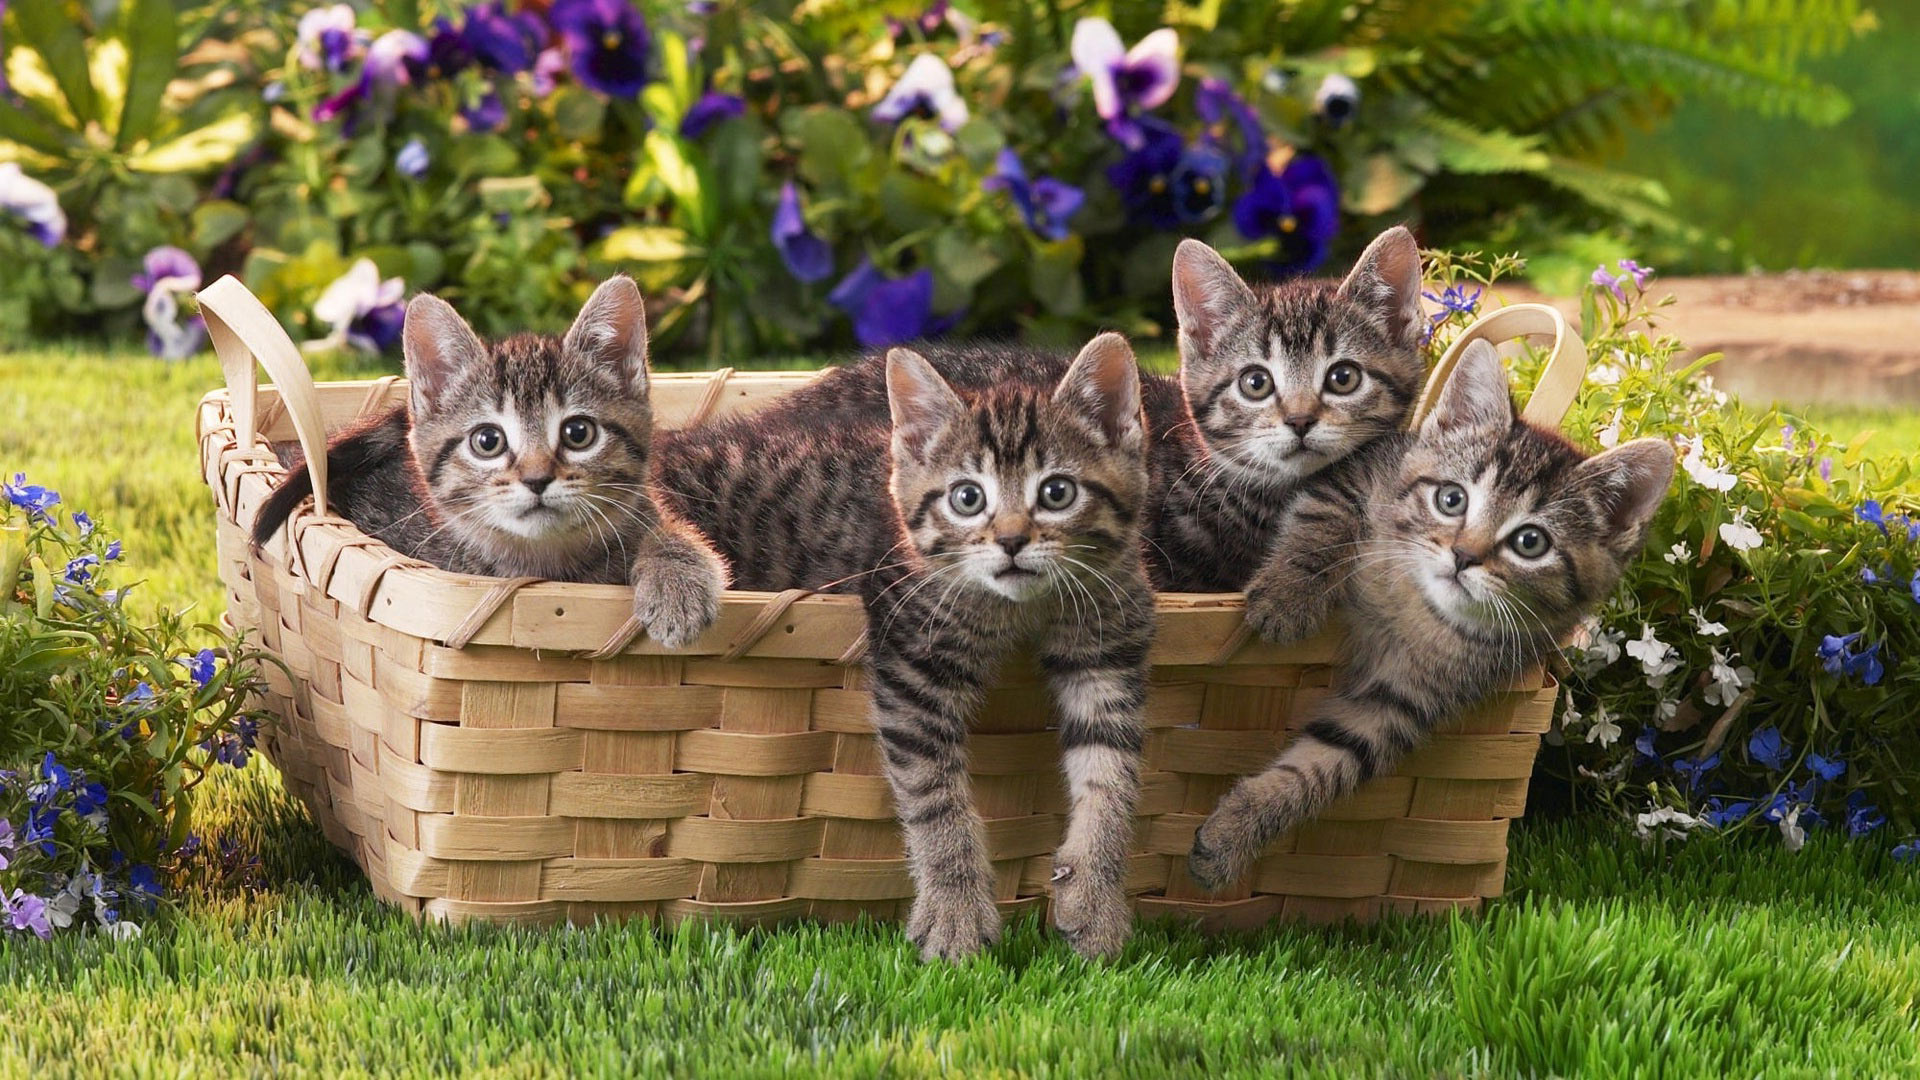 котенок возле корзины  № 117575 бесплатно